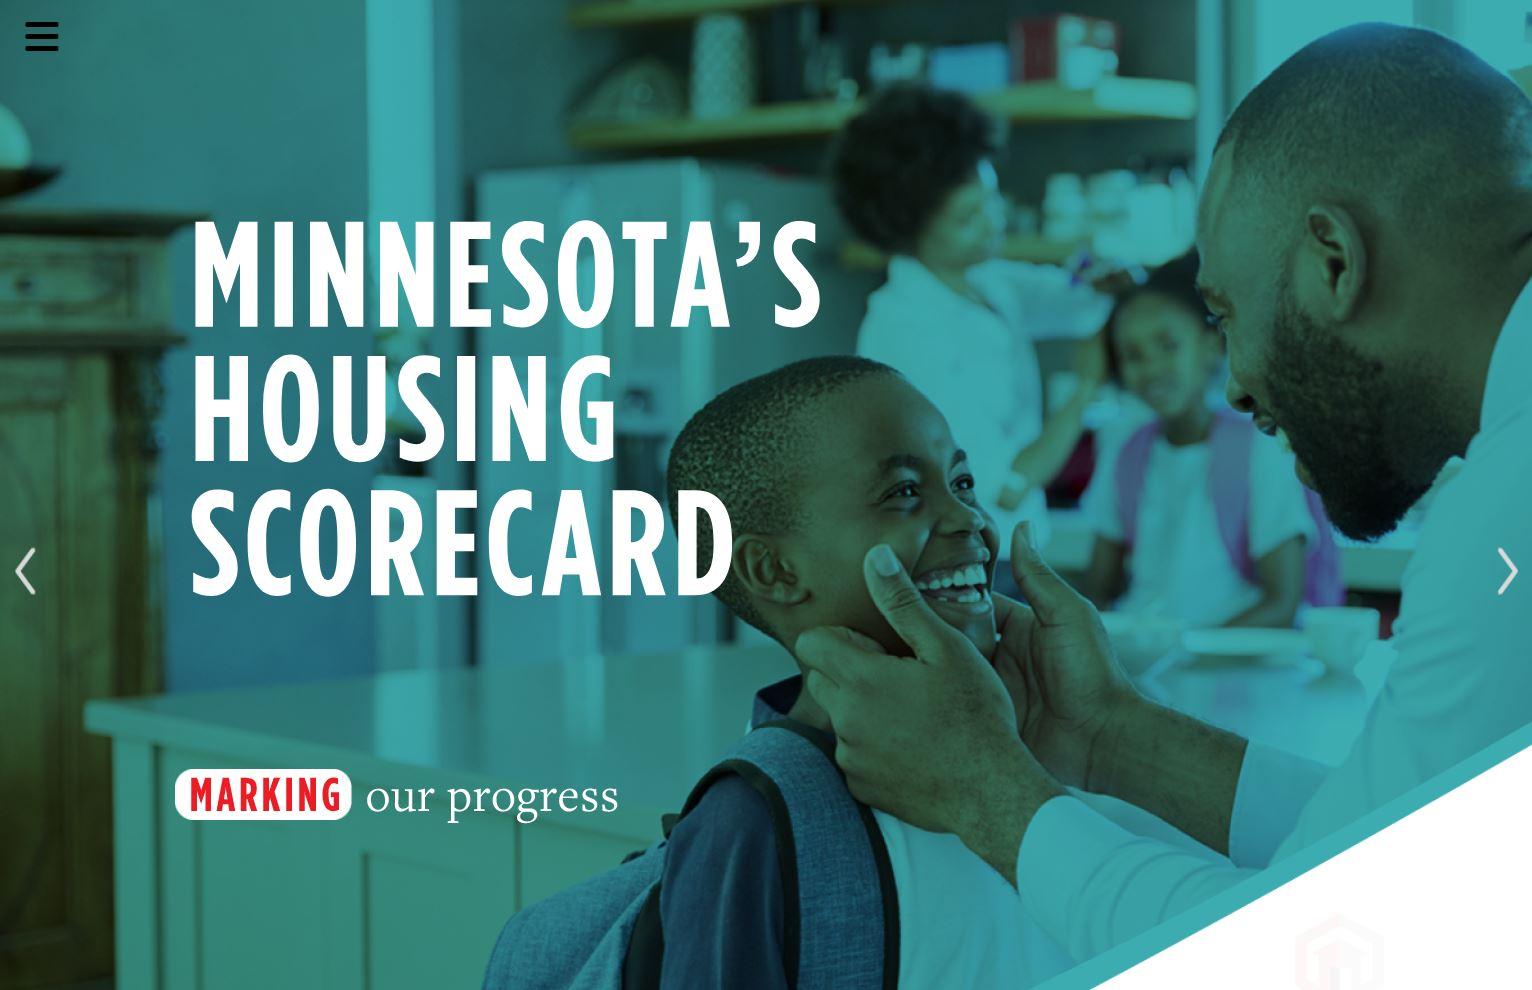 MinnesotasHousingScorecard